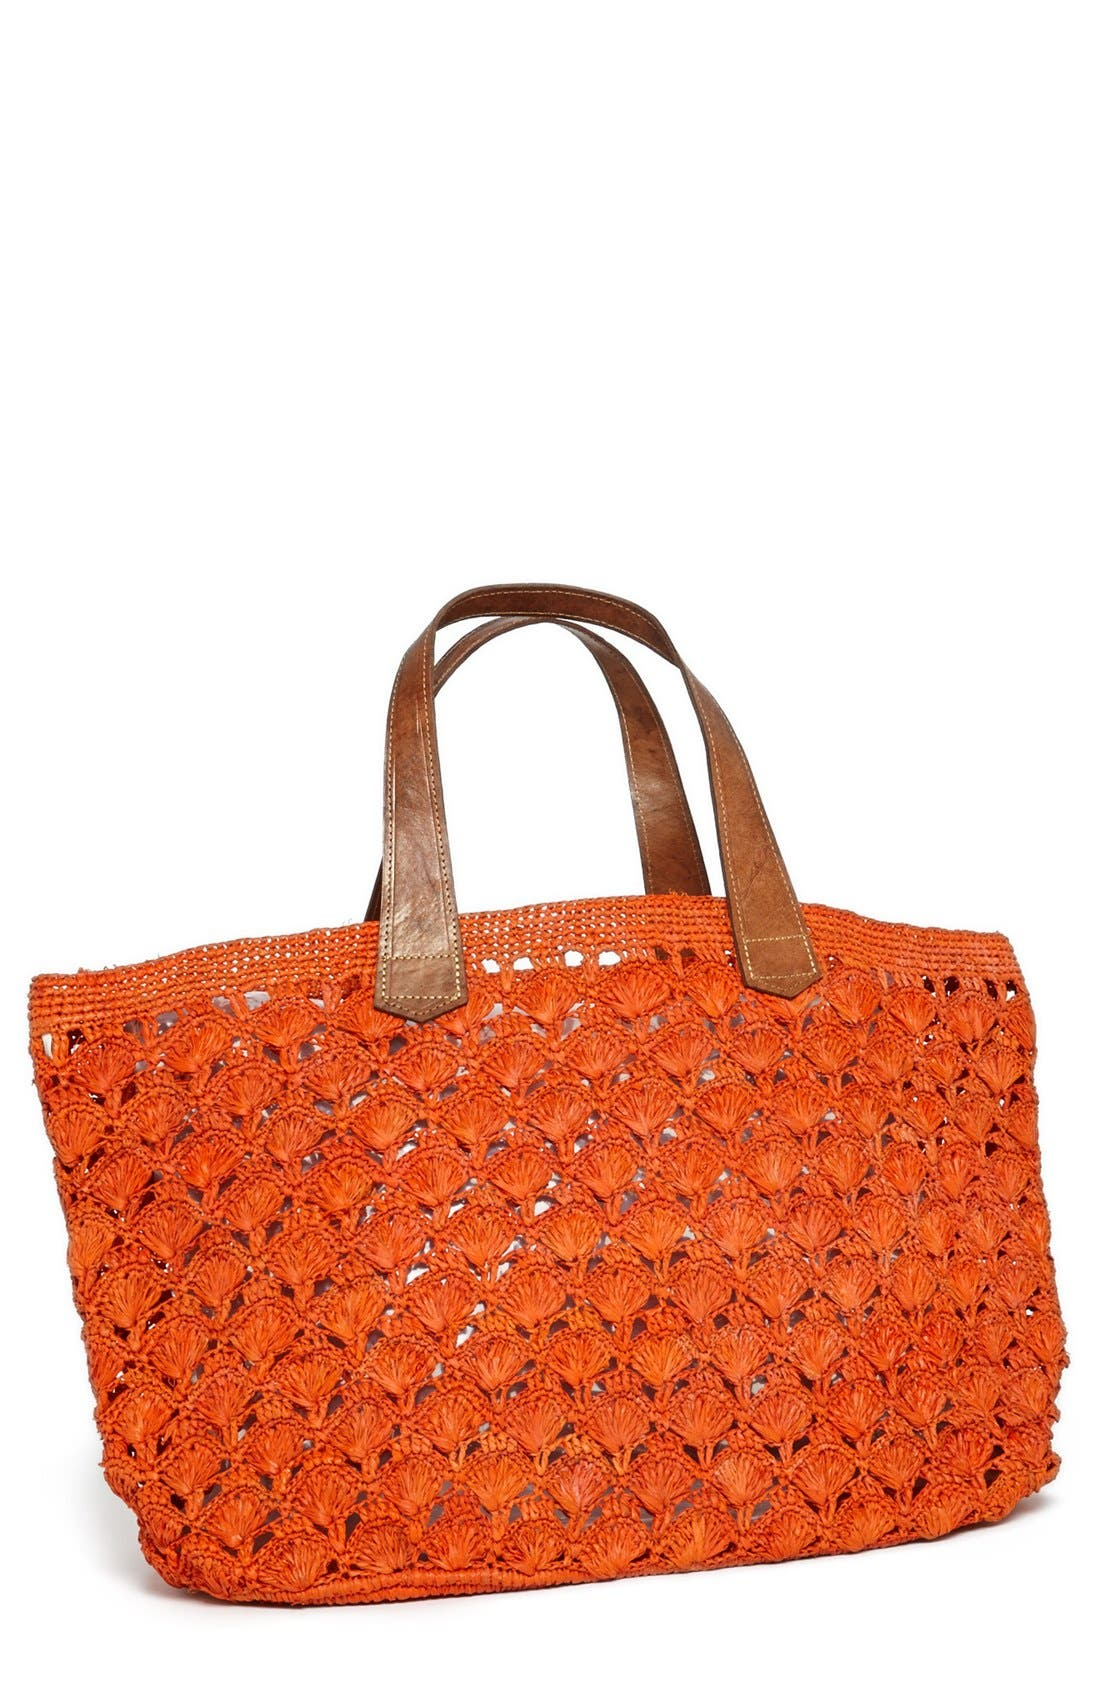 Alternate Image 1 Selected - Mar y Sol 'Valencia' Crocheted Raffia Tote